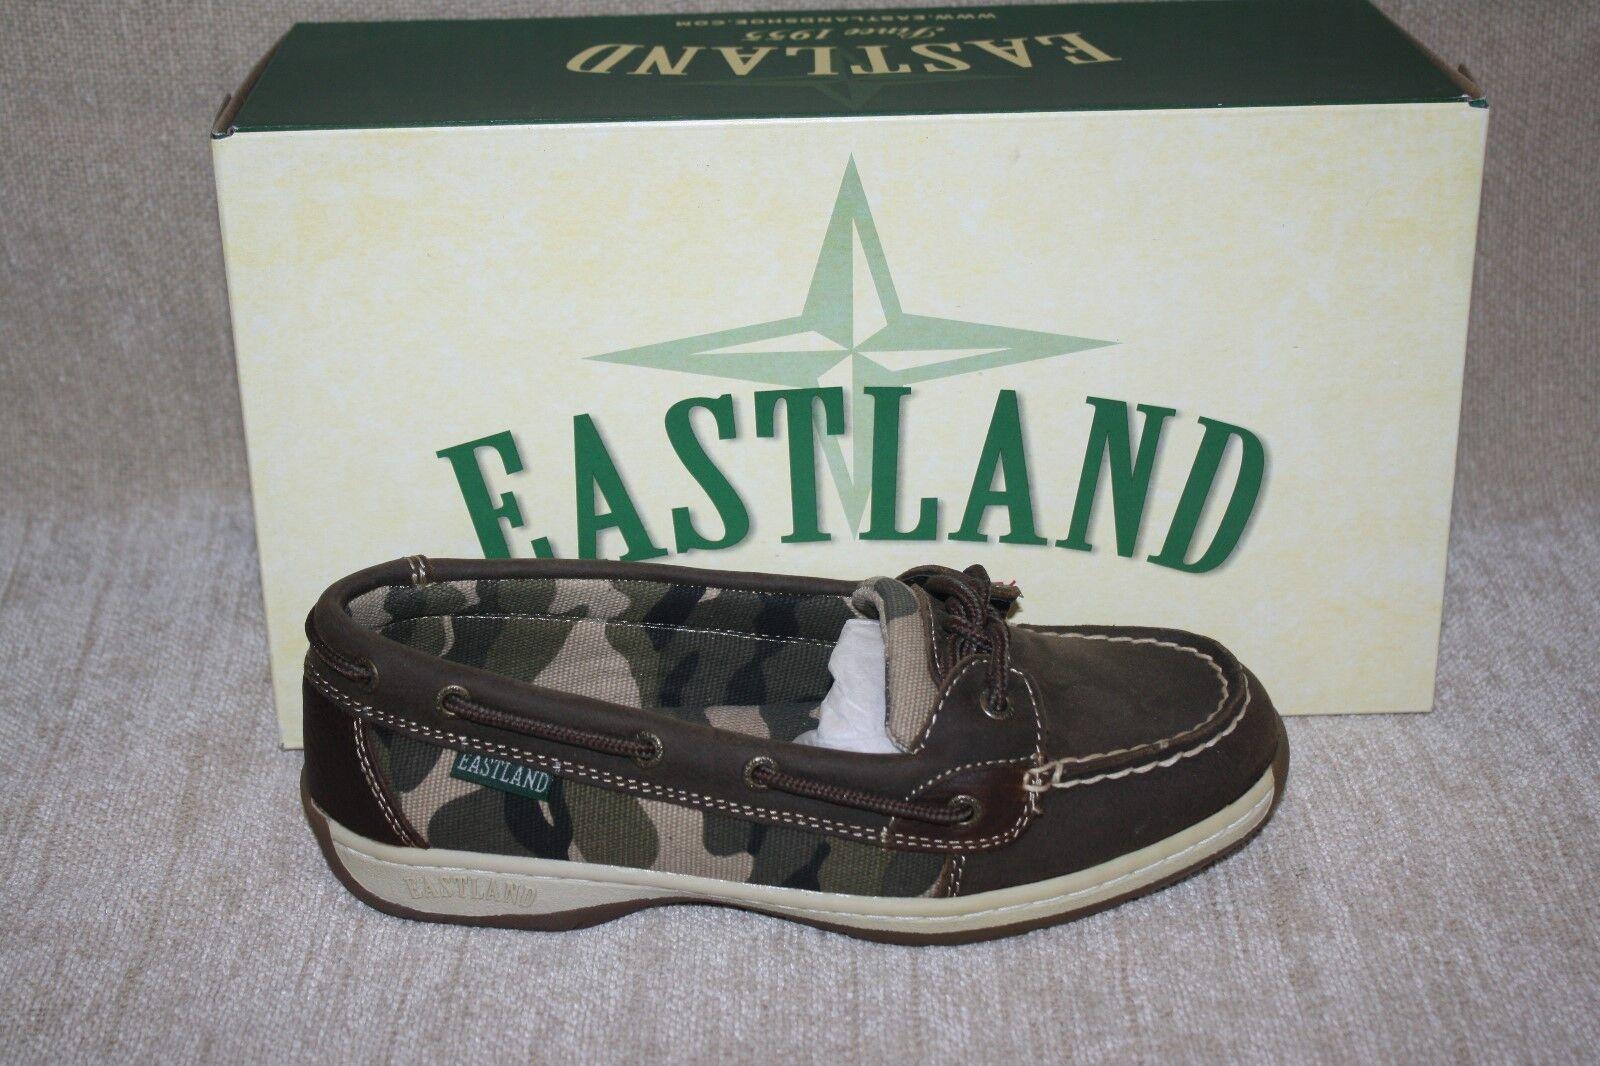 Damenschuhe EASTLAND OLIVE CAMO SUNRISE BOAT Schuhe-MULTIPLE SIZES (B140)